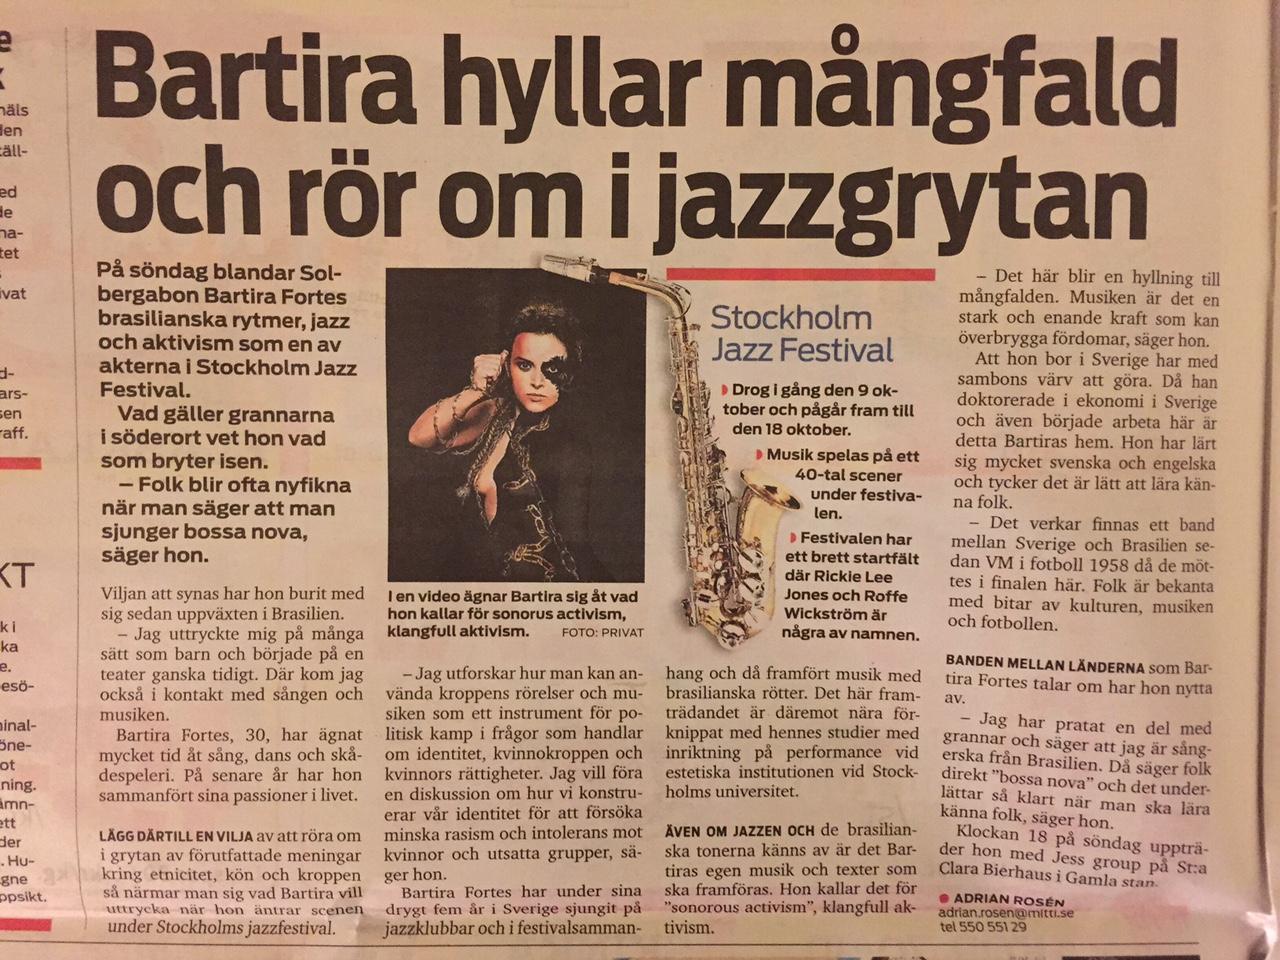 Intervju - jazzfestivalen 2015 - Mitt i.jpg